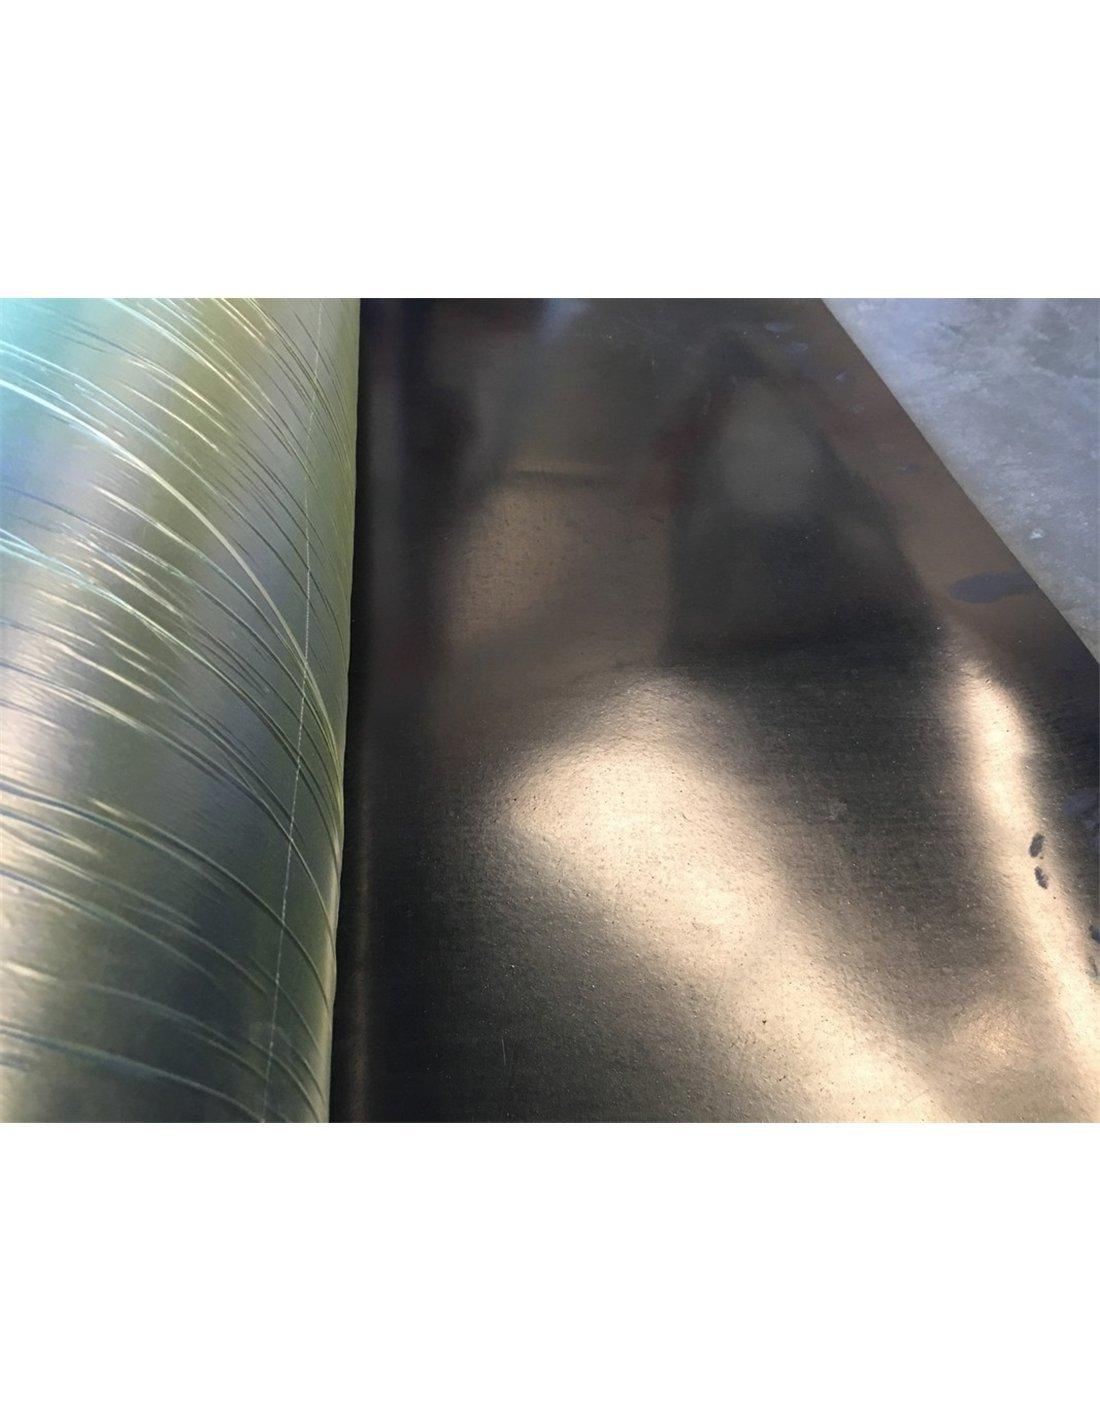 Plancha SBR 1,40M Ancho Jardin202 3mm Metro Lineal